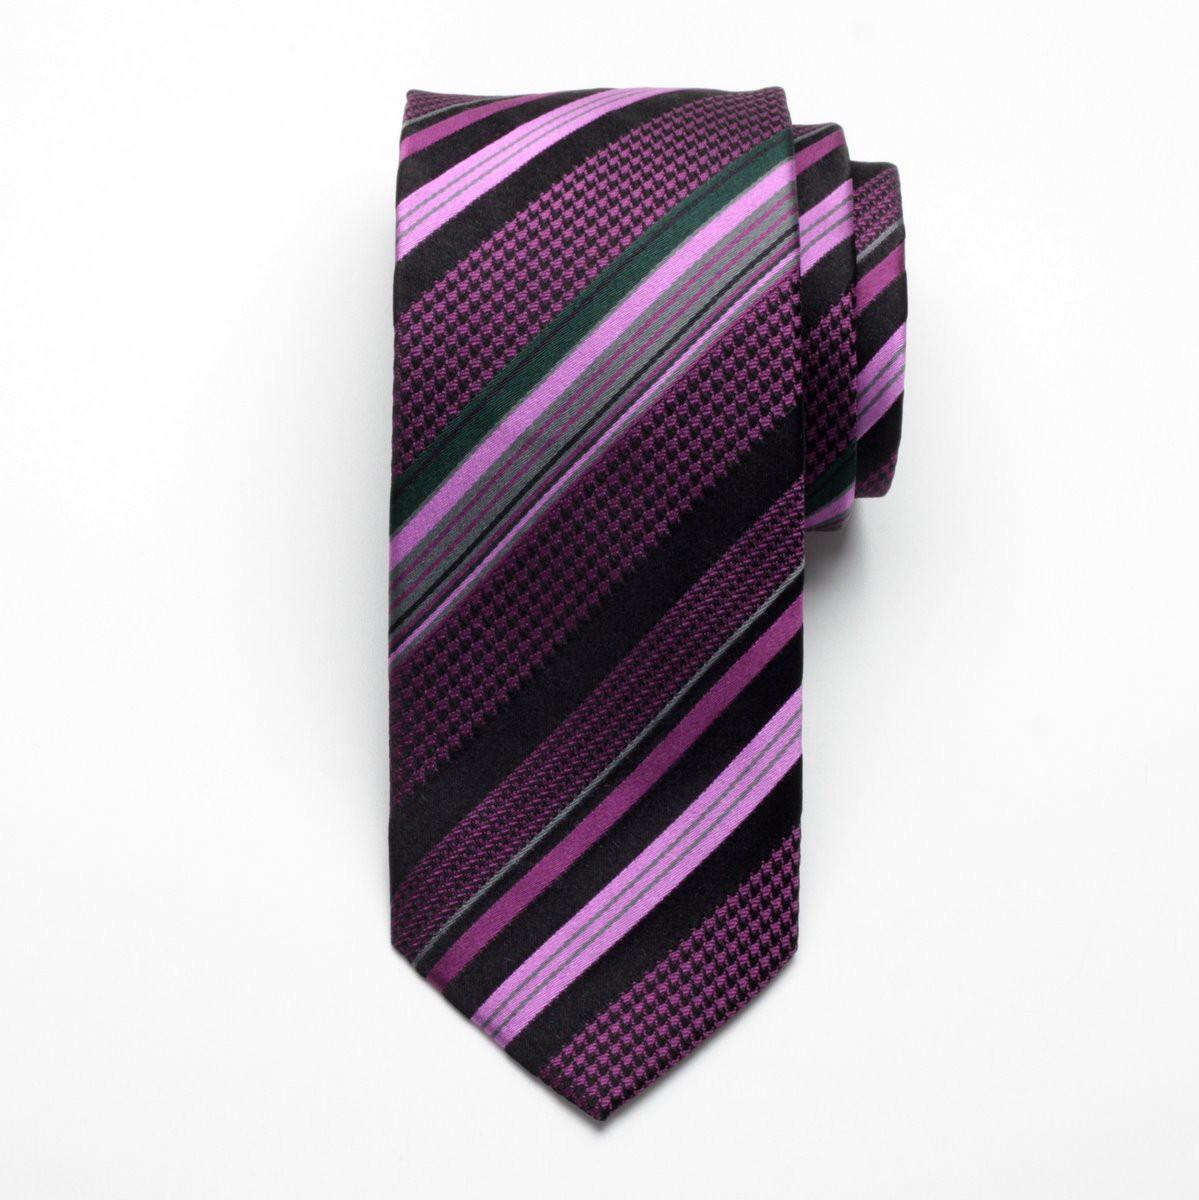 Krawat jedwabny Fine Selection (wzór 92)